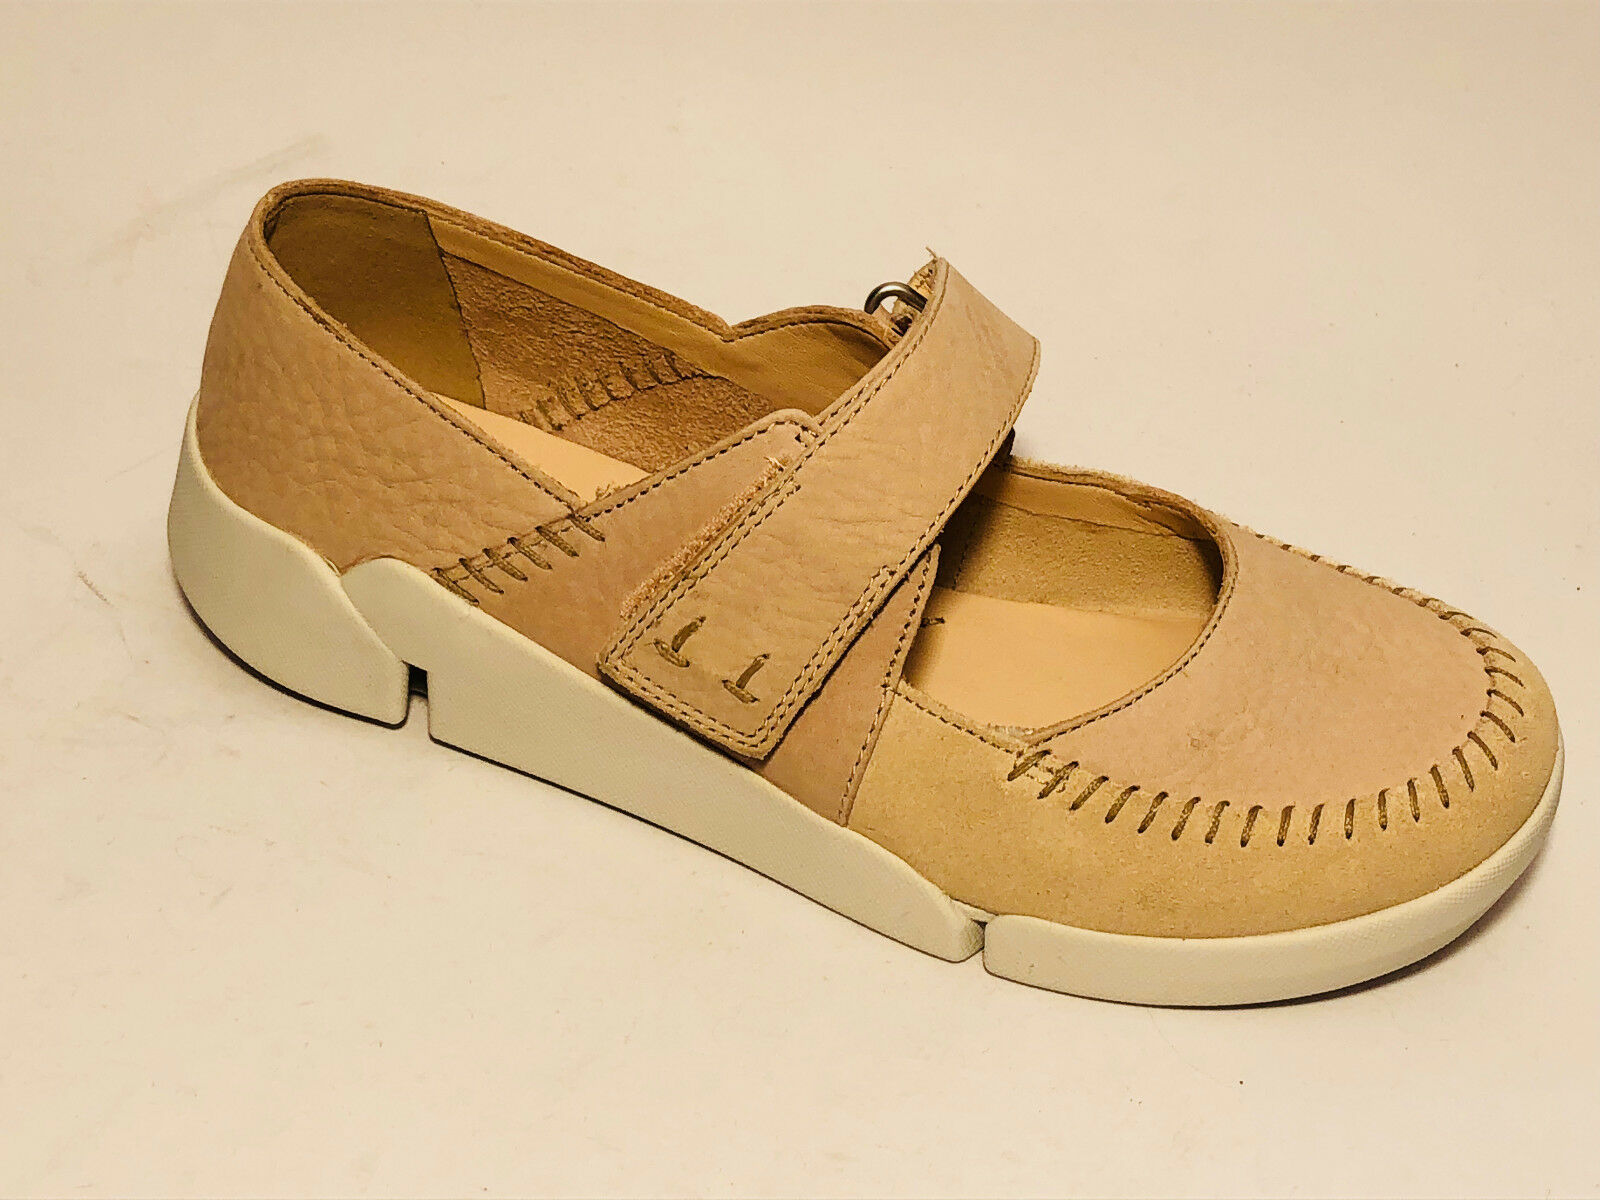 Clarks Schuhe ultra leichte Leder sport Slipper Gr. 39 (6) lt.pink Ristriemchen